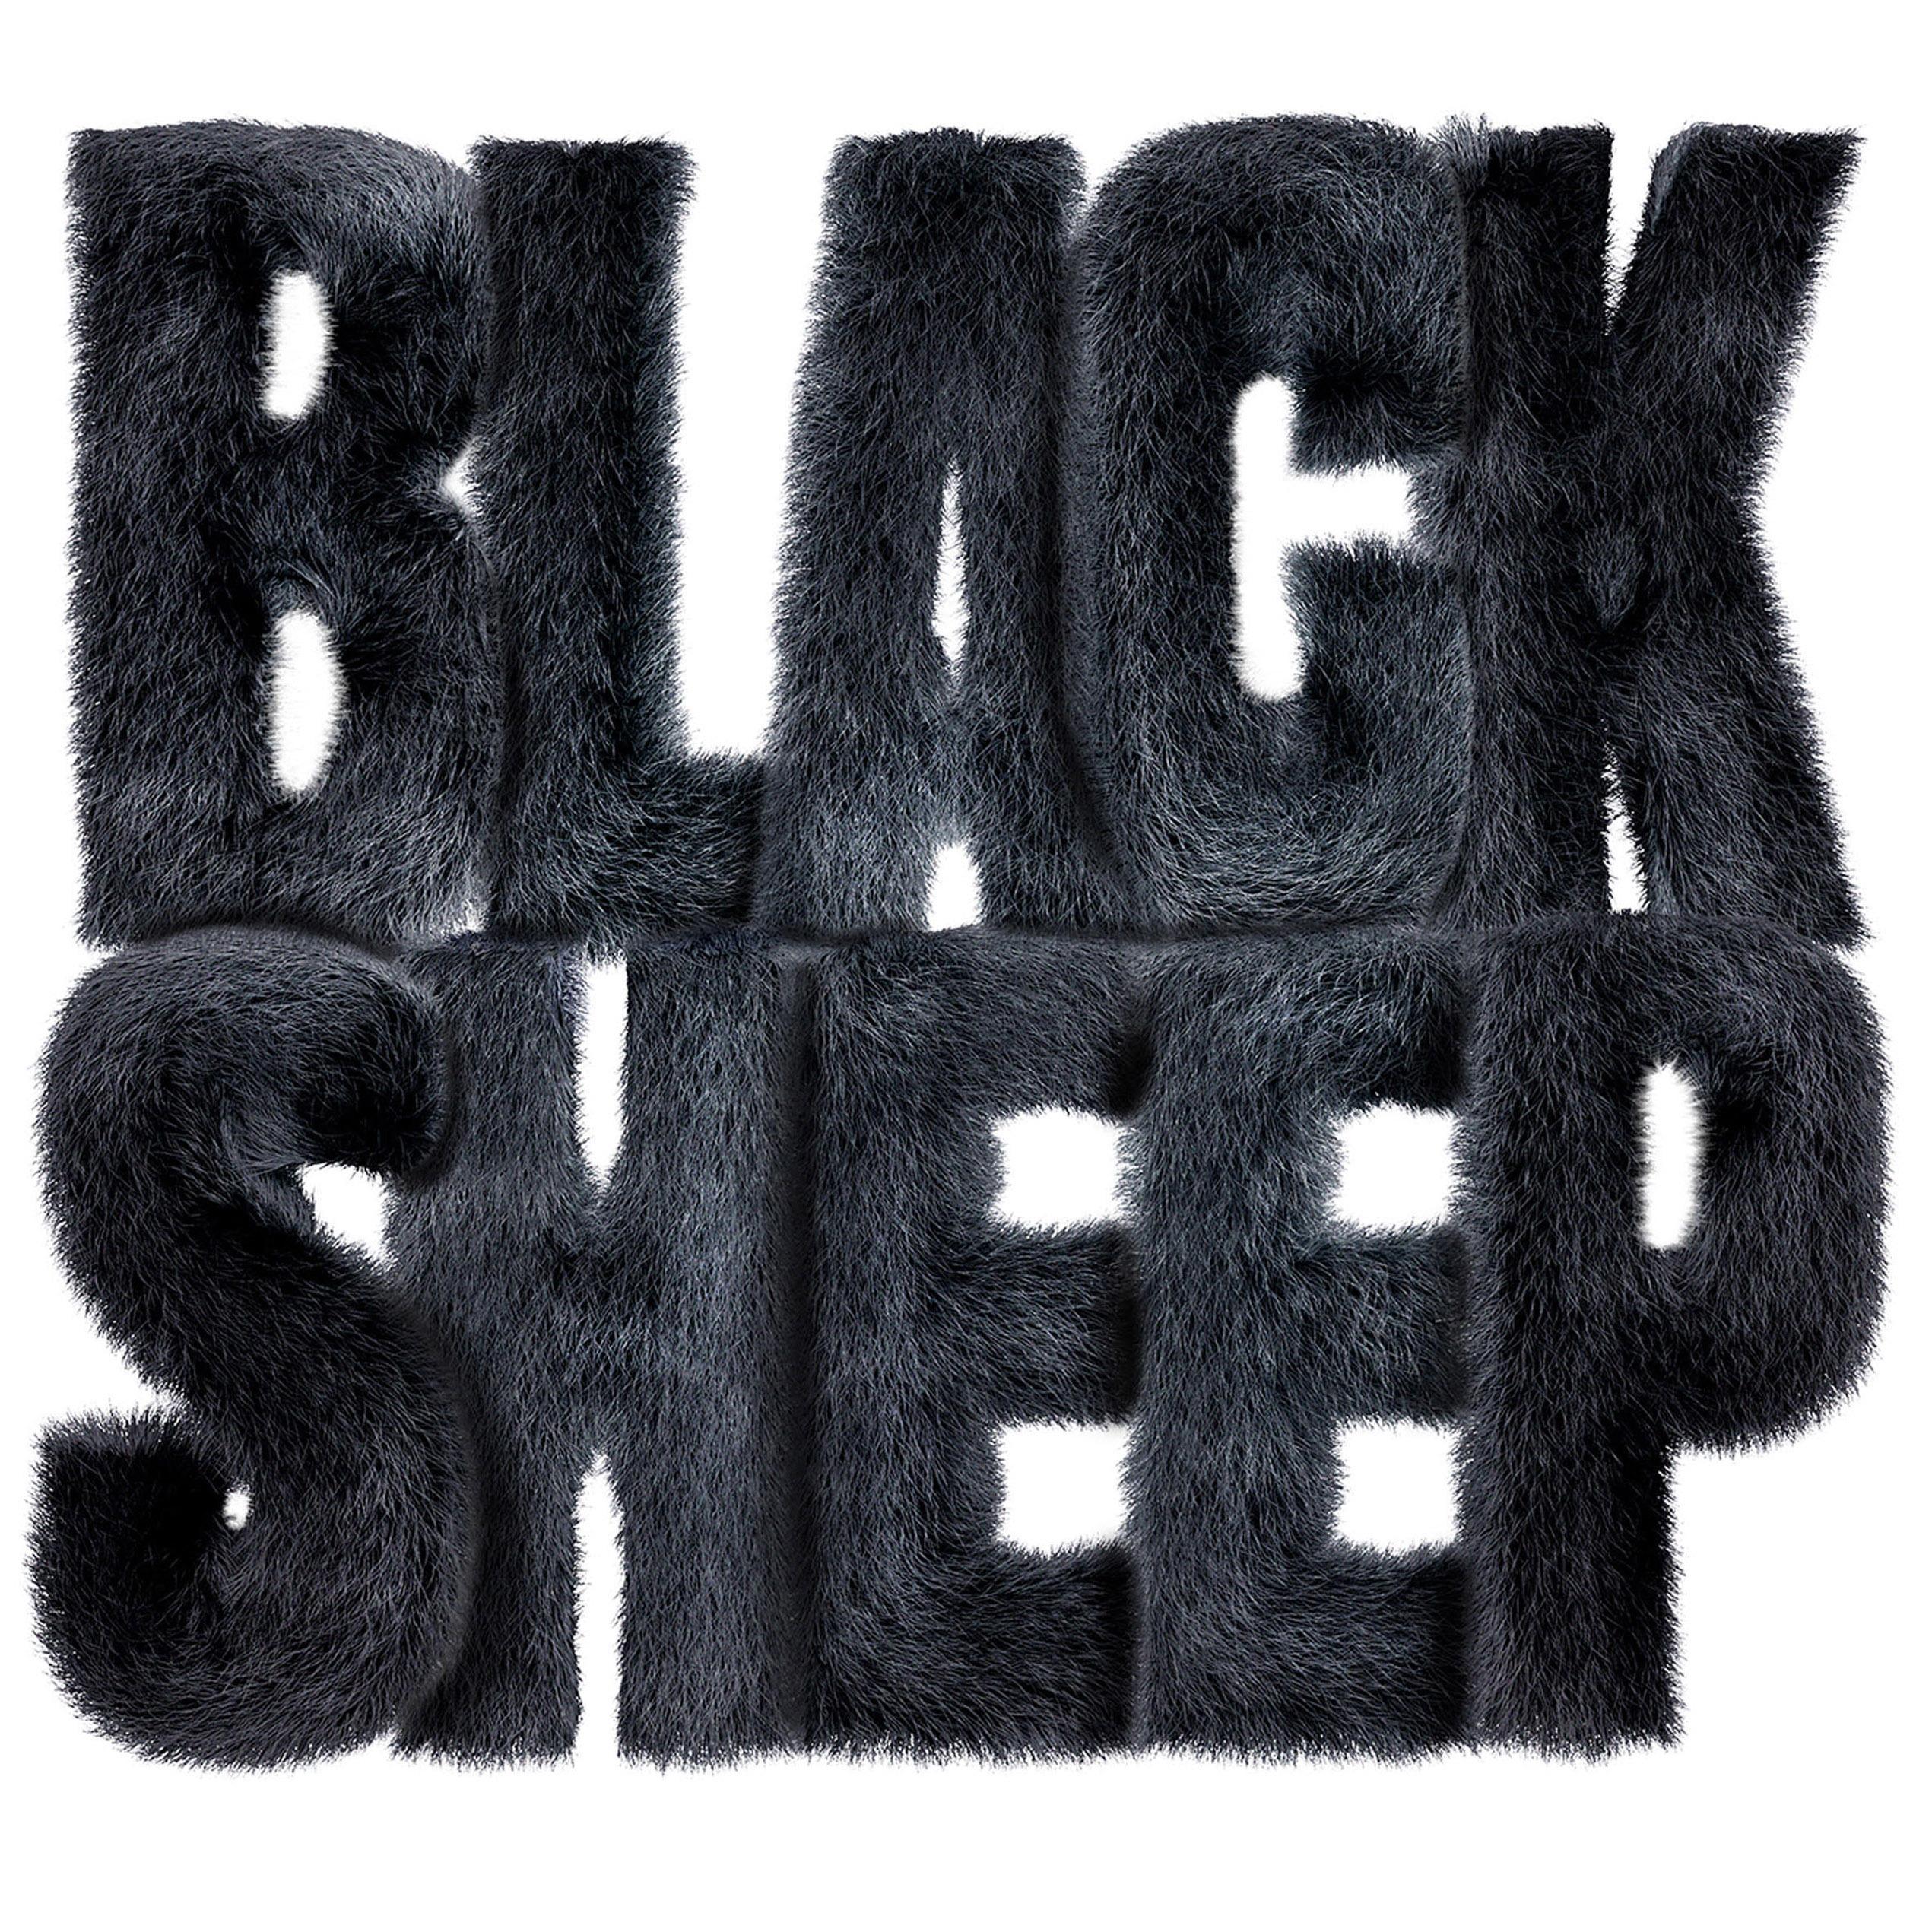 Black Sheep by BBH